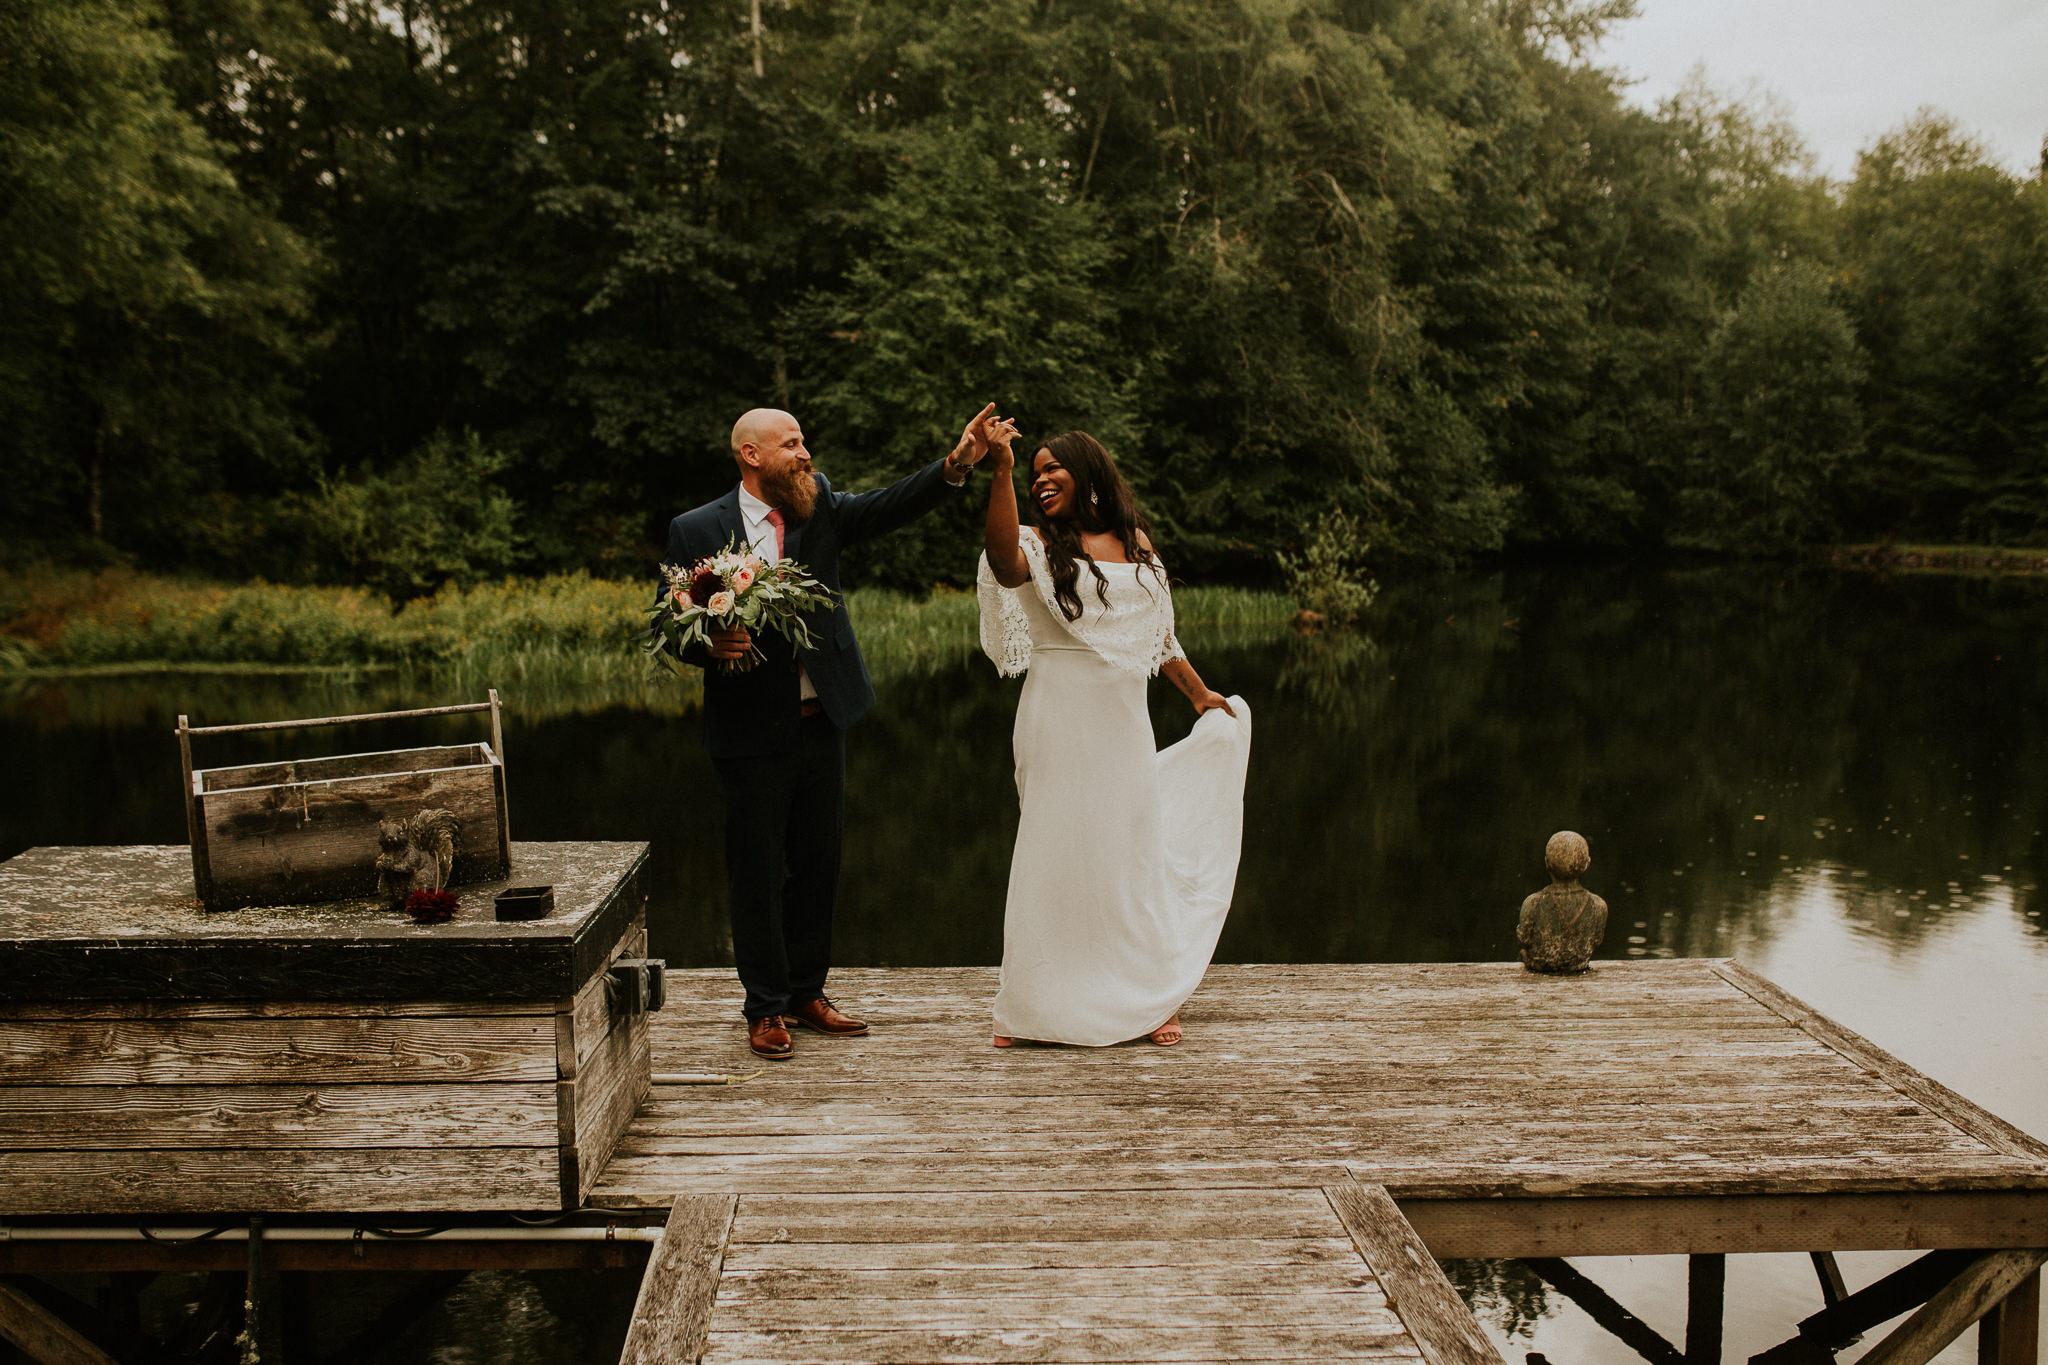 Lakeside-elopement-teasers-14.jpg